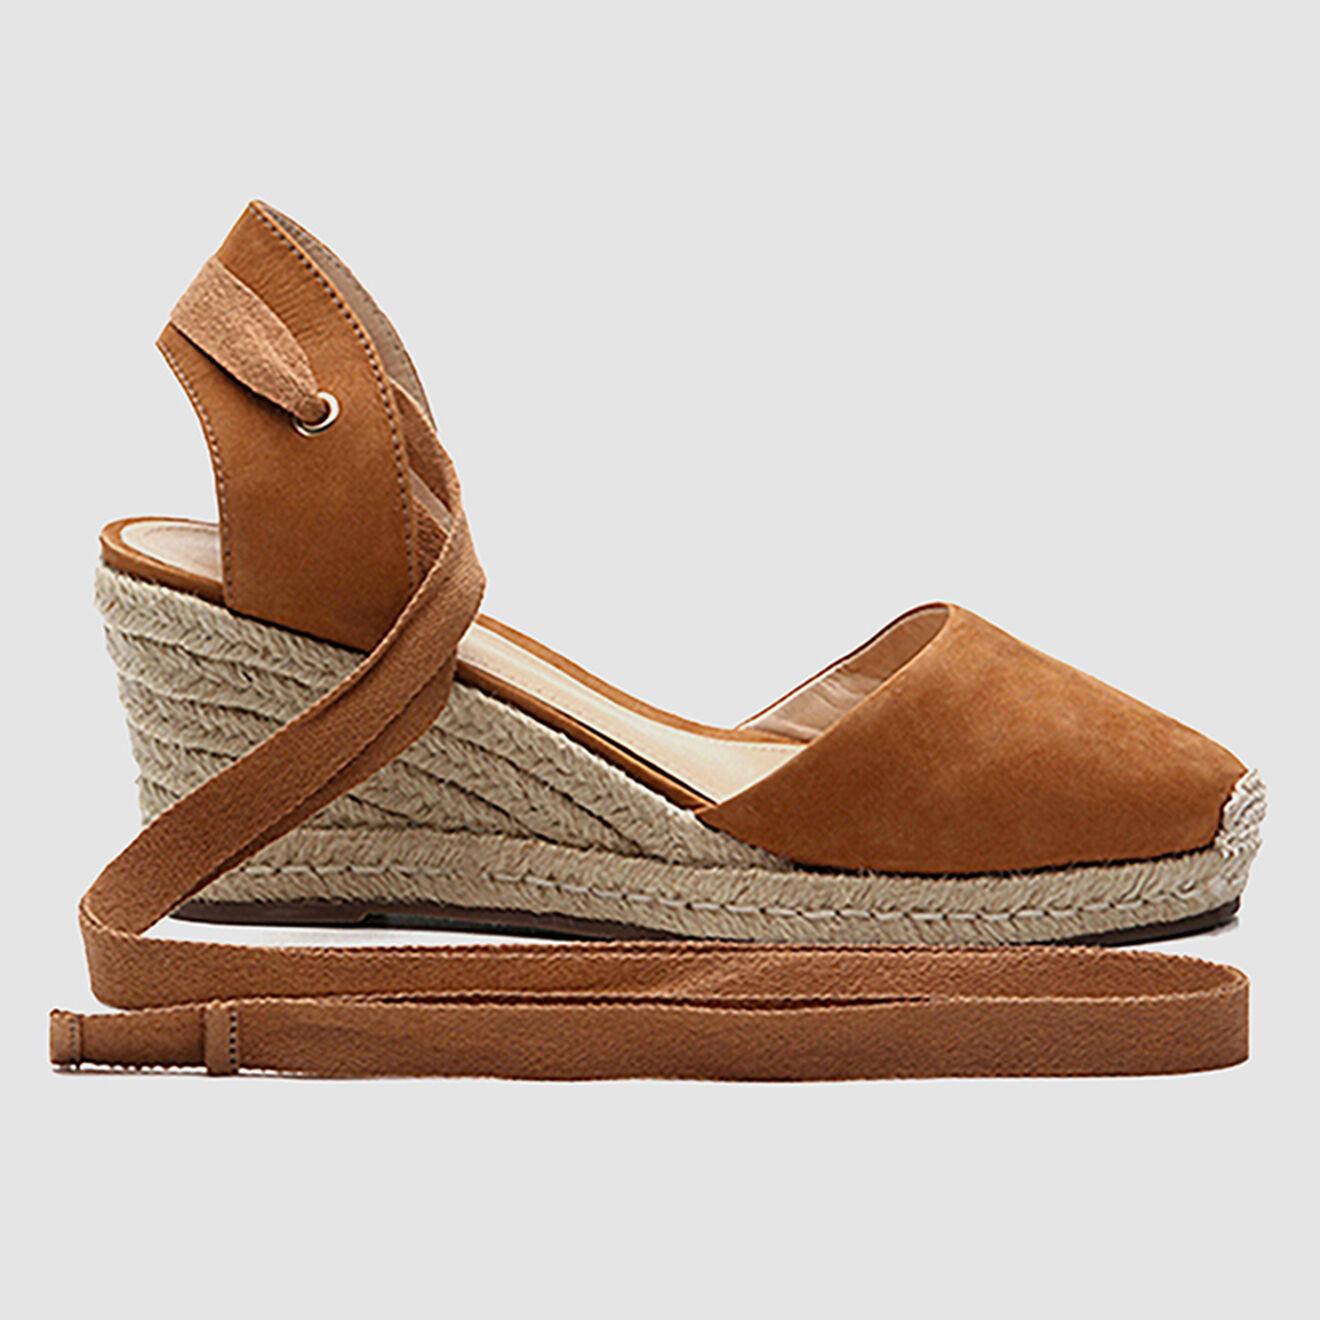 Sandales compensées en Velours de Cuir Alesa cognac - Talon 6 cm - Cosmoparis - Modalova